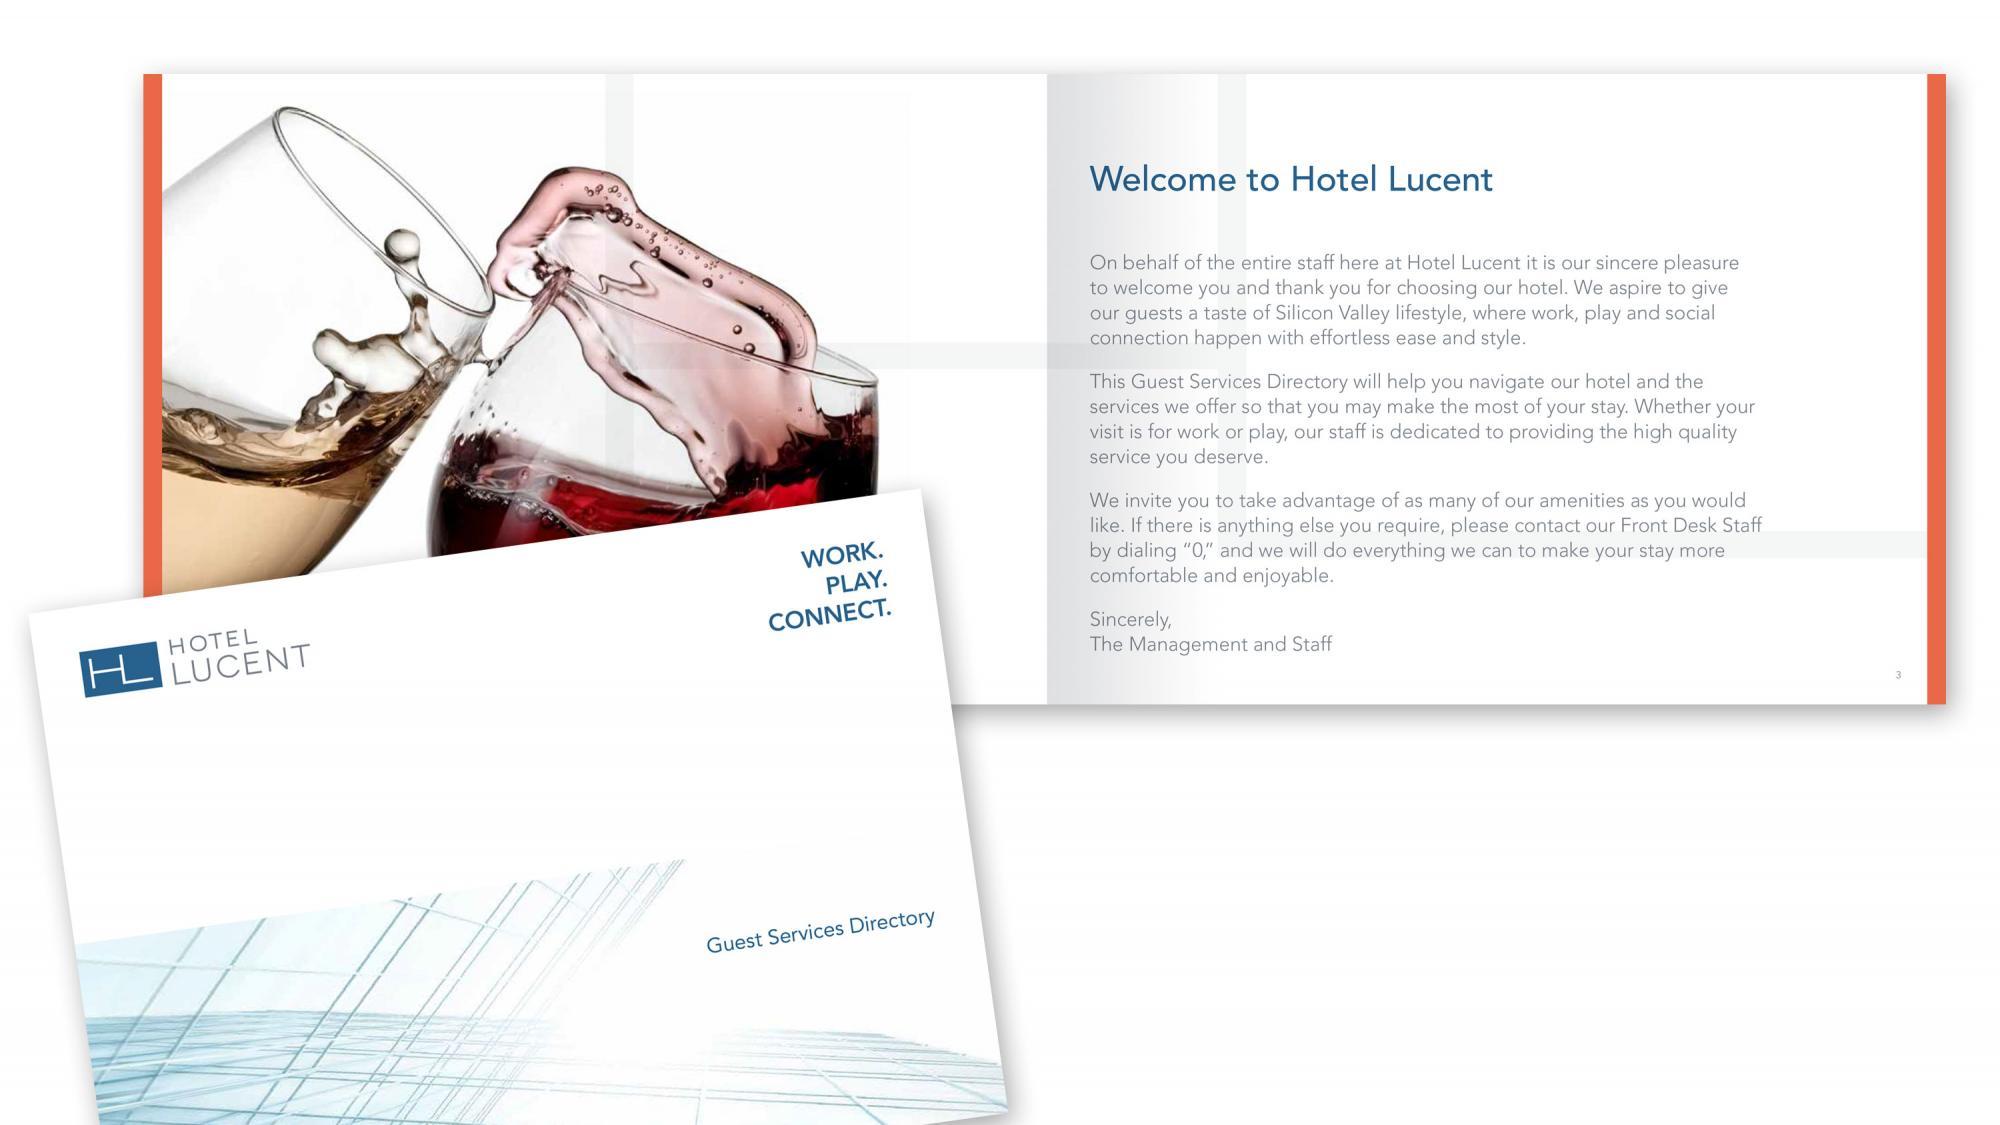 MINT_HotelLucent